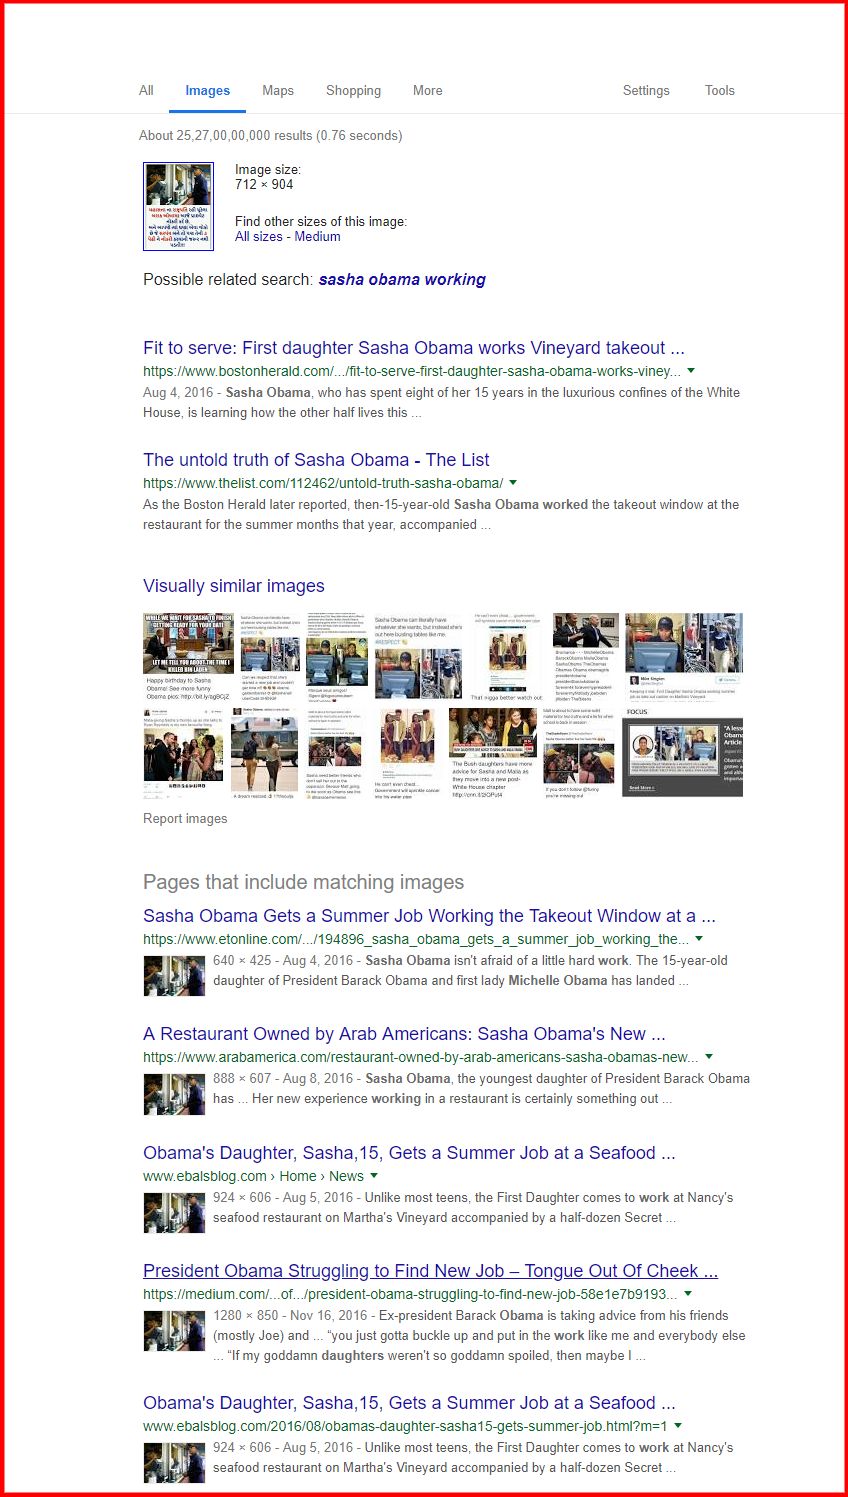 screenshot-www.google.com-2019.06.04-06-32-27.png